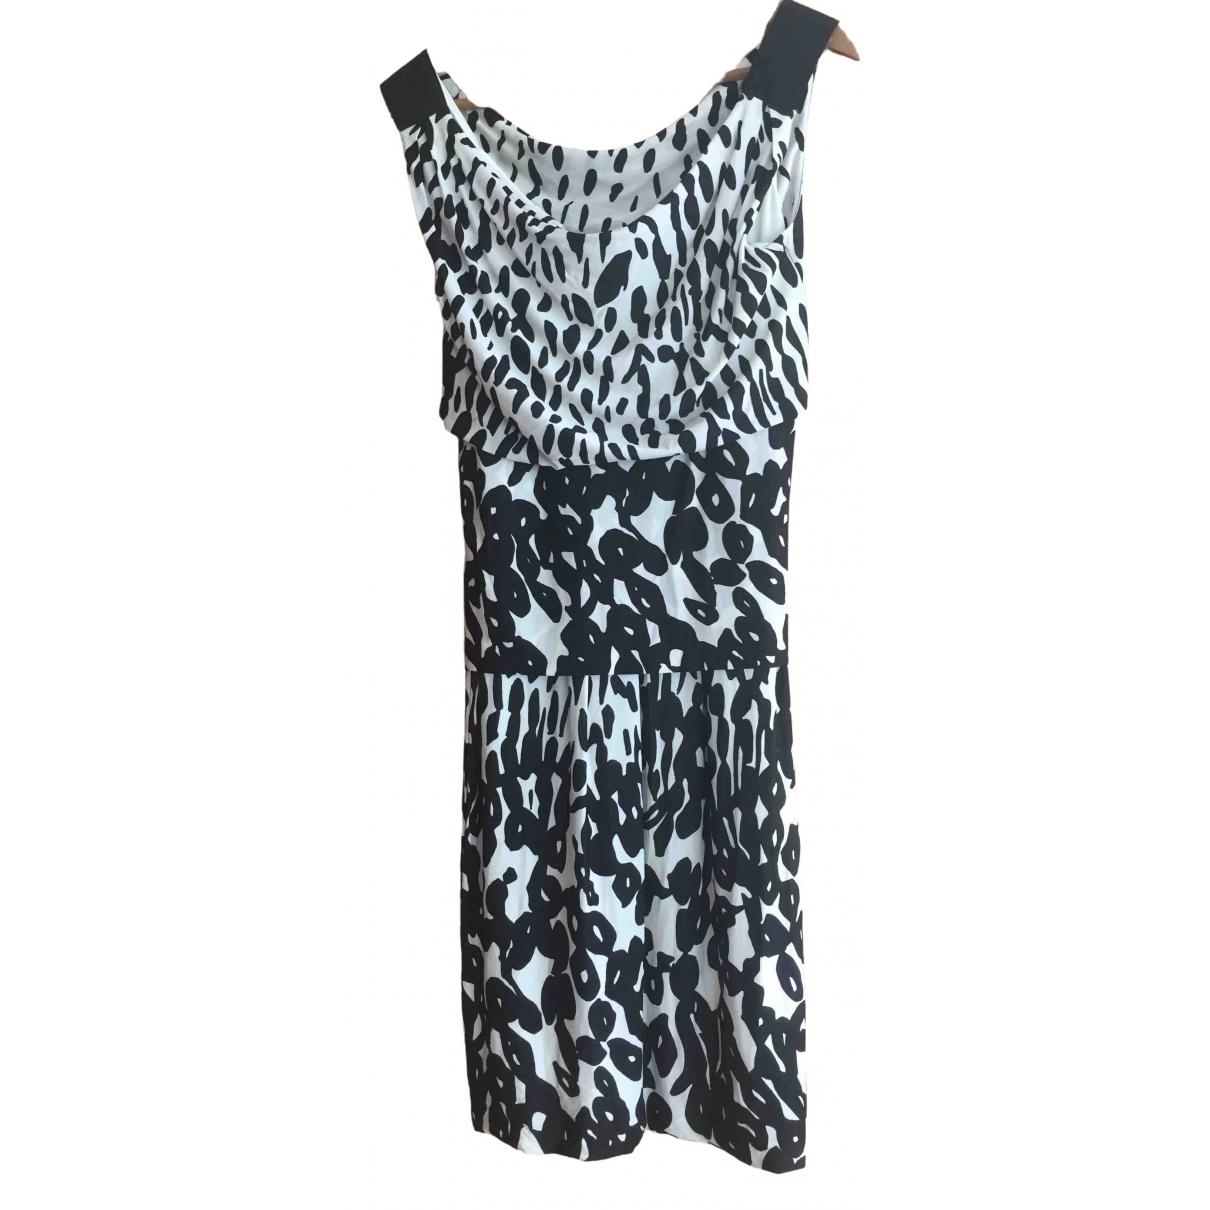 Max Mara \N Multicolour dress for Women 42 IT